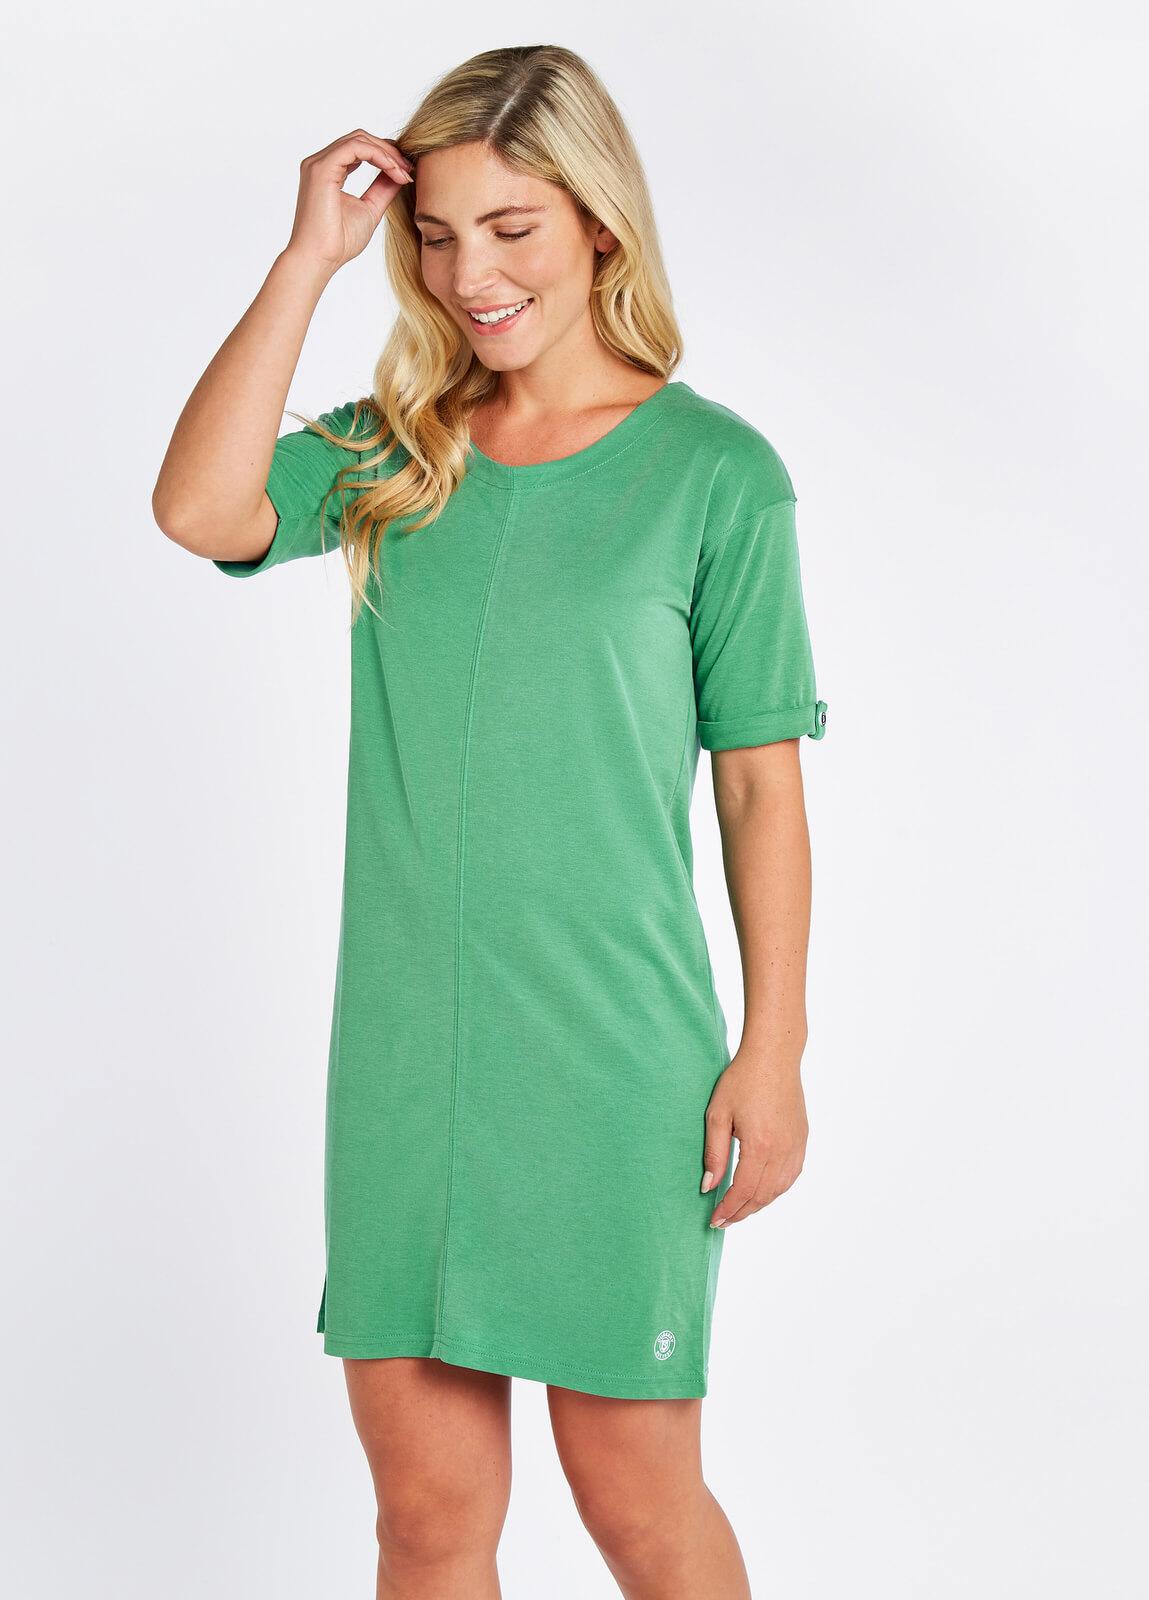 Coolbeg Tunic Dress - Kelly Green